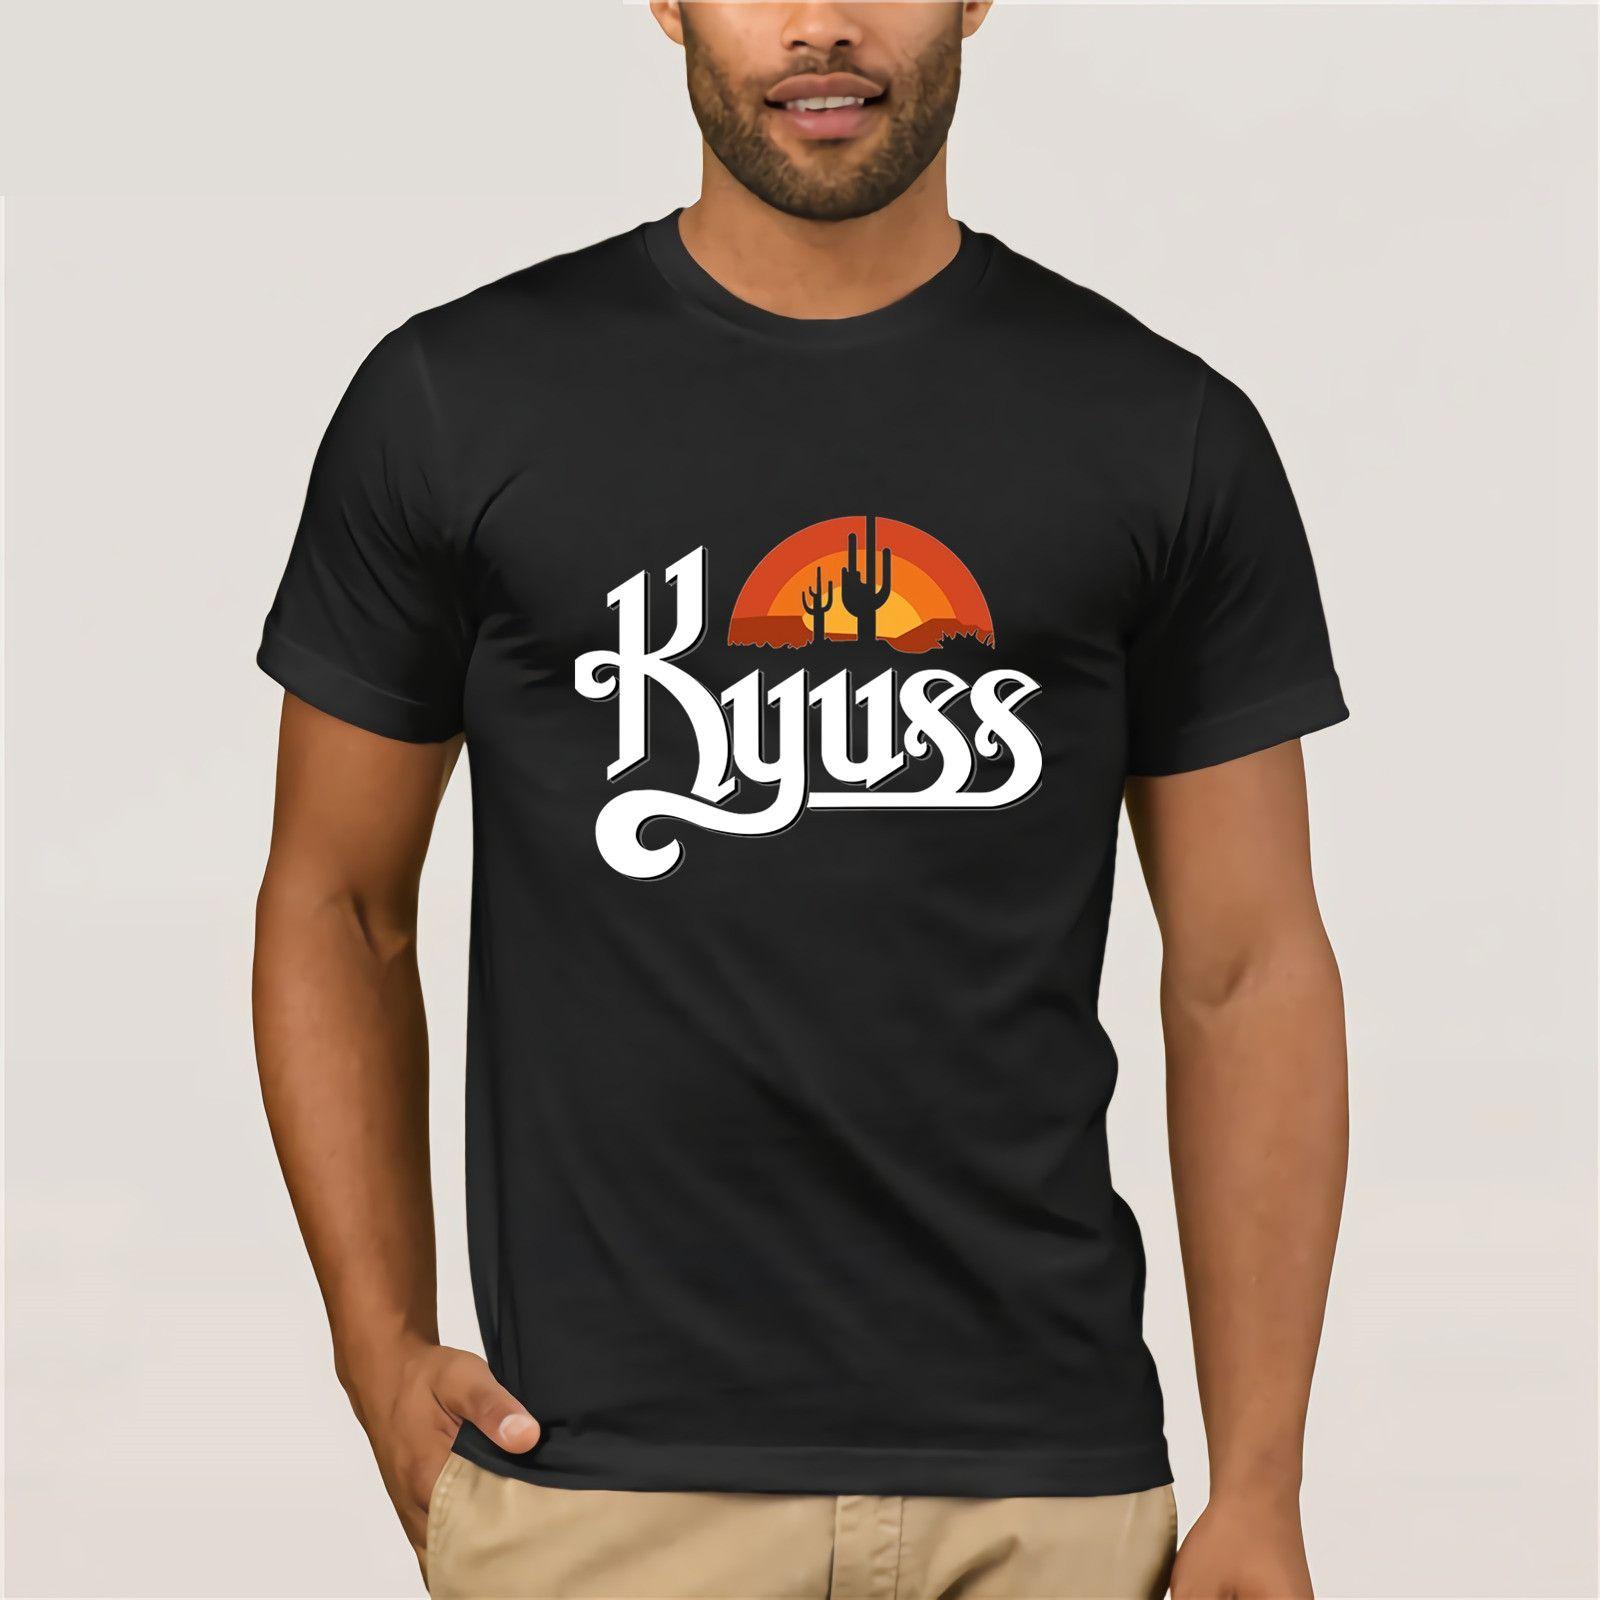 Stoner Rock Southern Bnad camiseta Kyuss T shirt Moda Casual Tees de Verão  Homme Camiseta Streetwear VENDA QUENTE